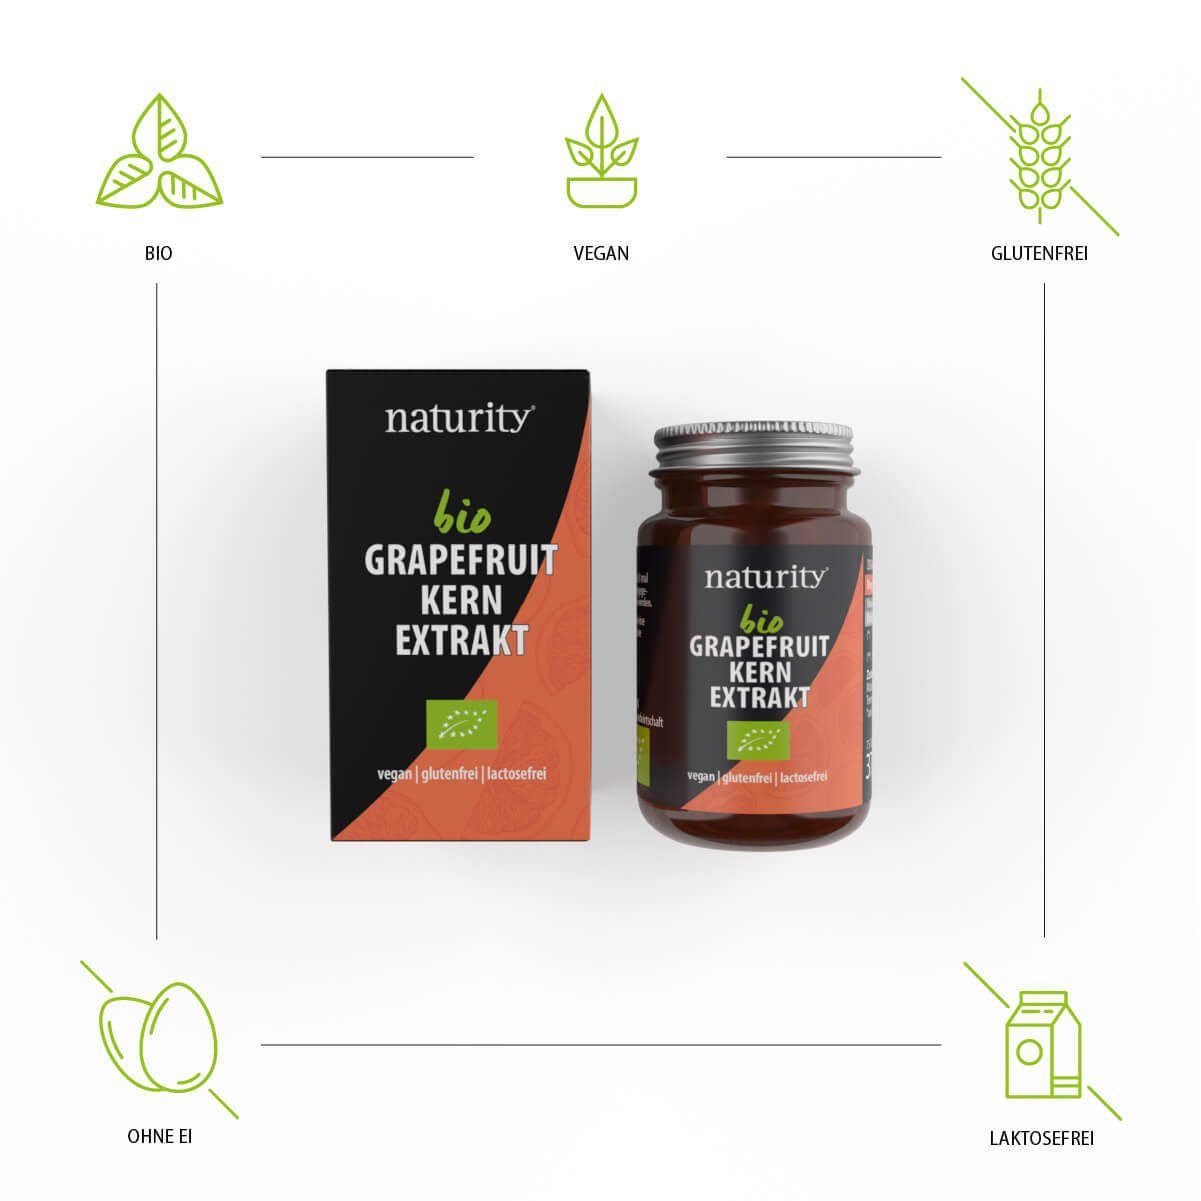 GRAPEFRUIT-KERN-EXTRAKT Tabletten + Vitamin C BIO